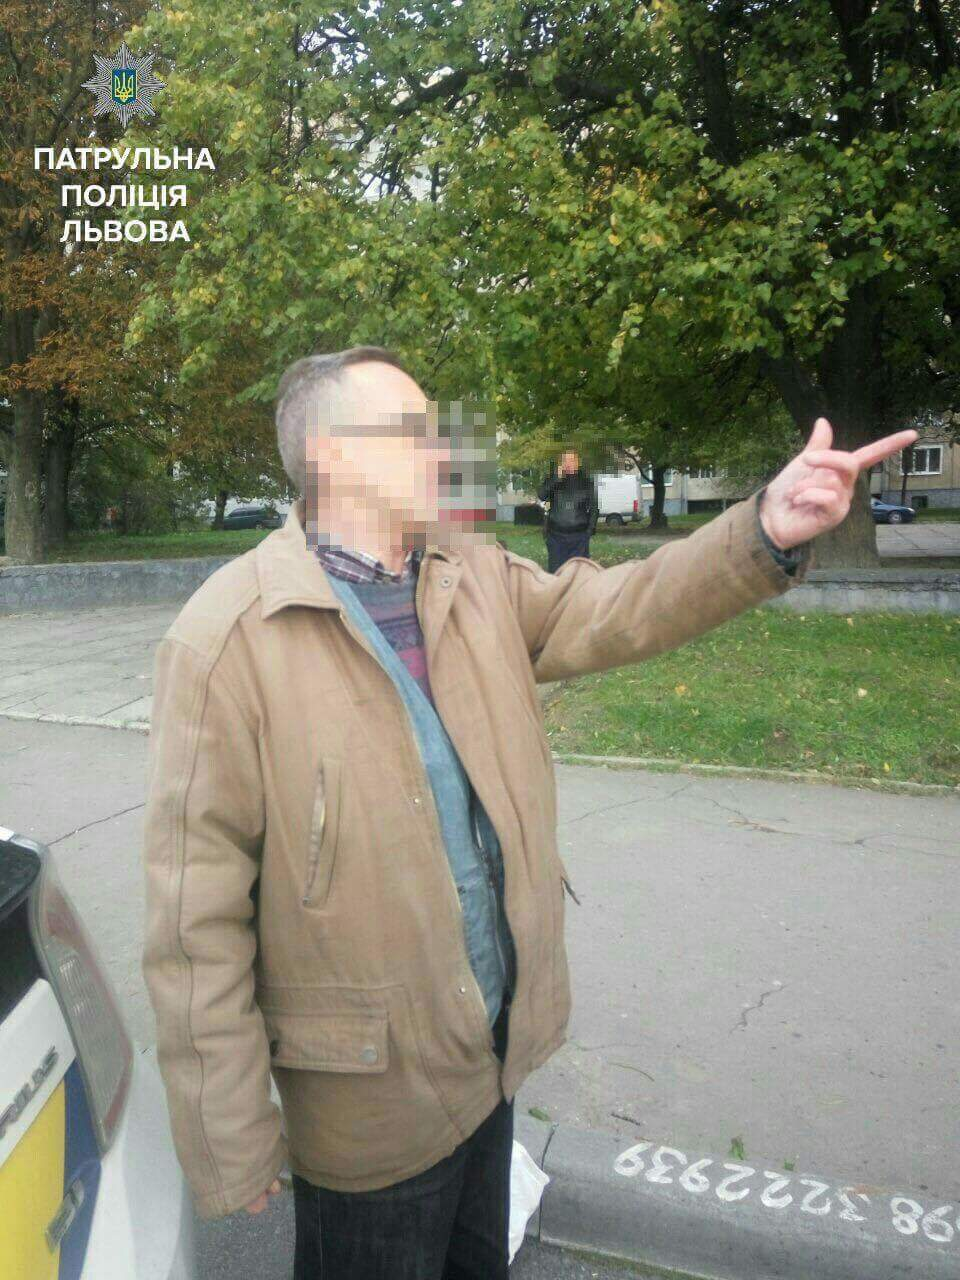 Во Львове задержали пьяного «телефонного террориста»